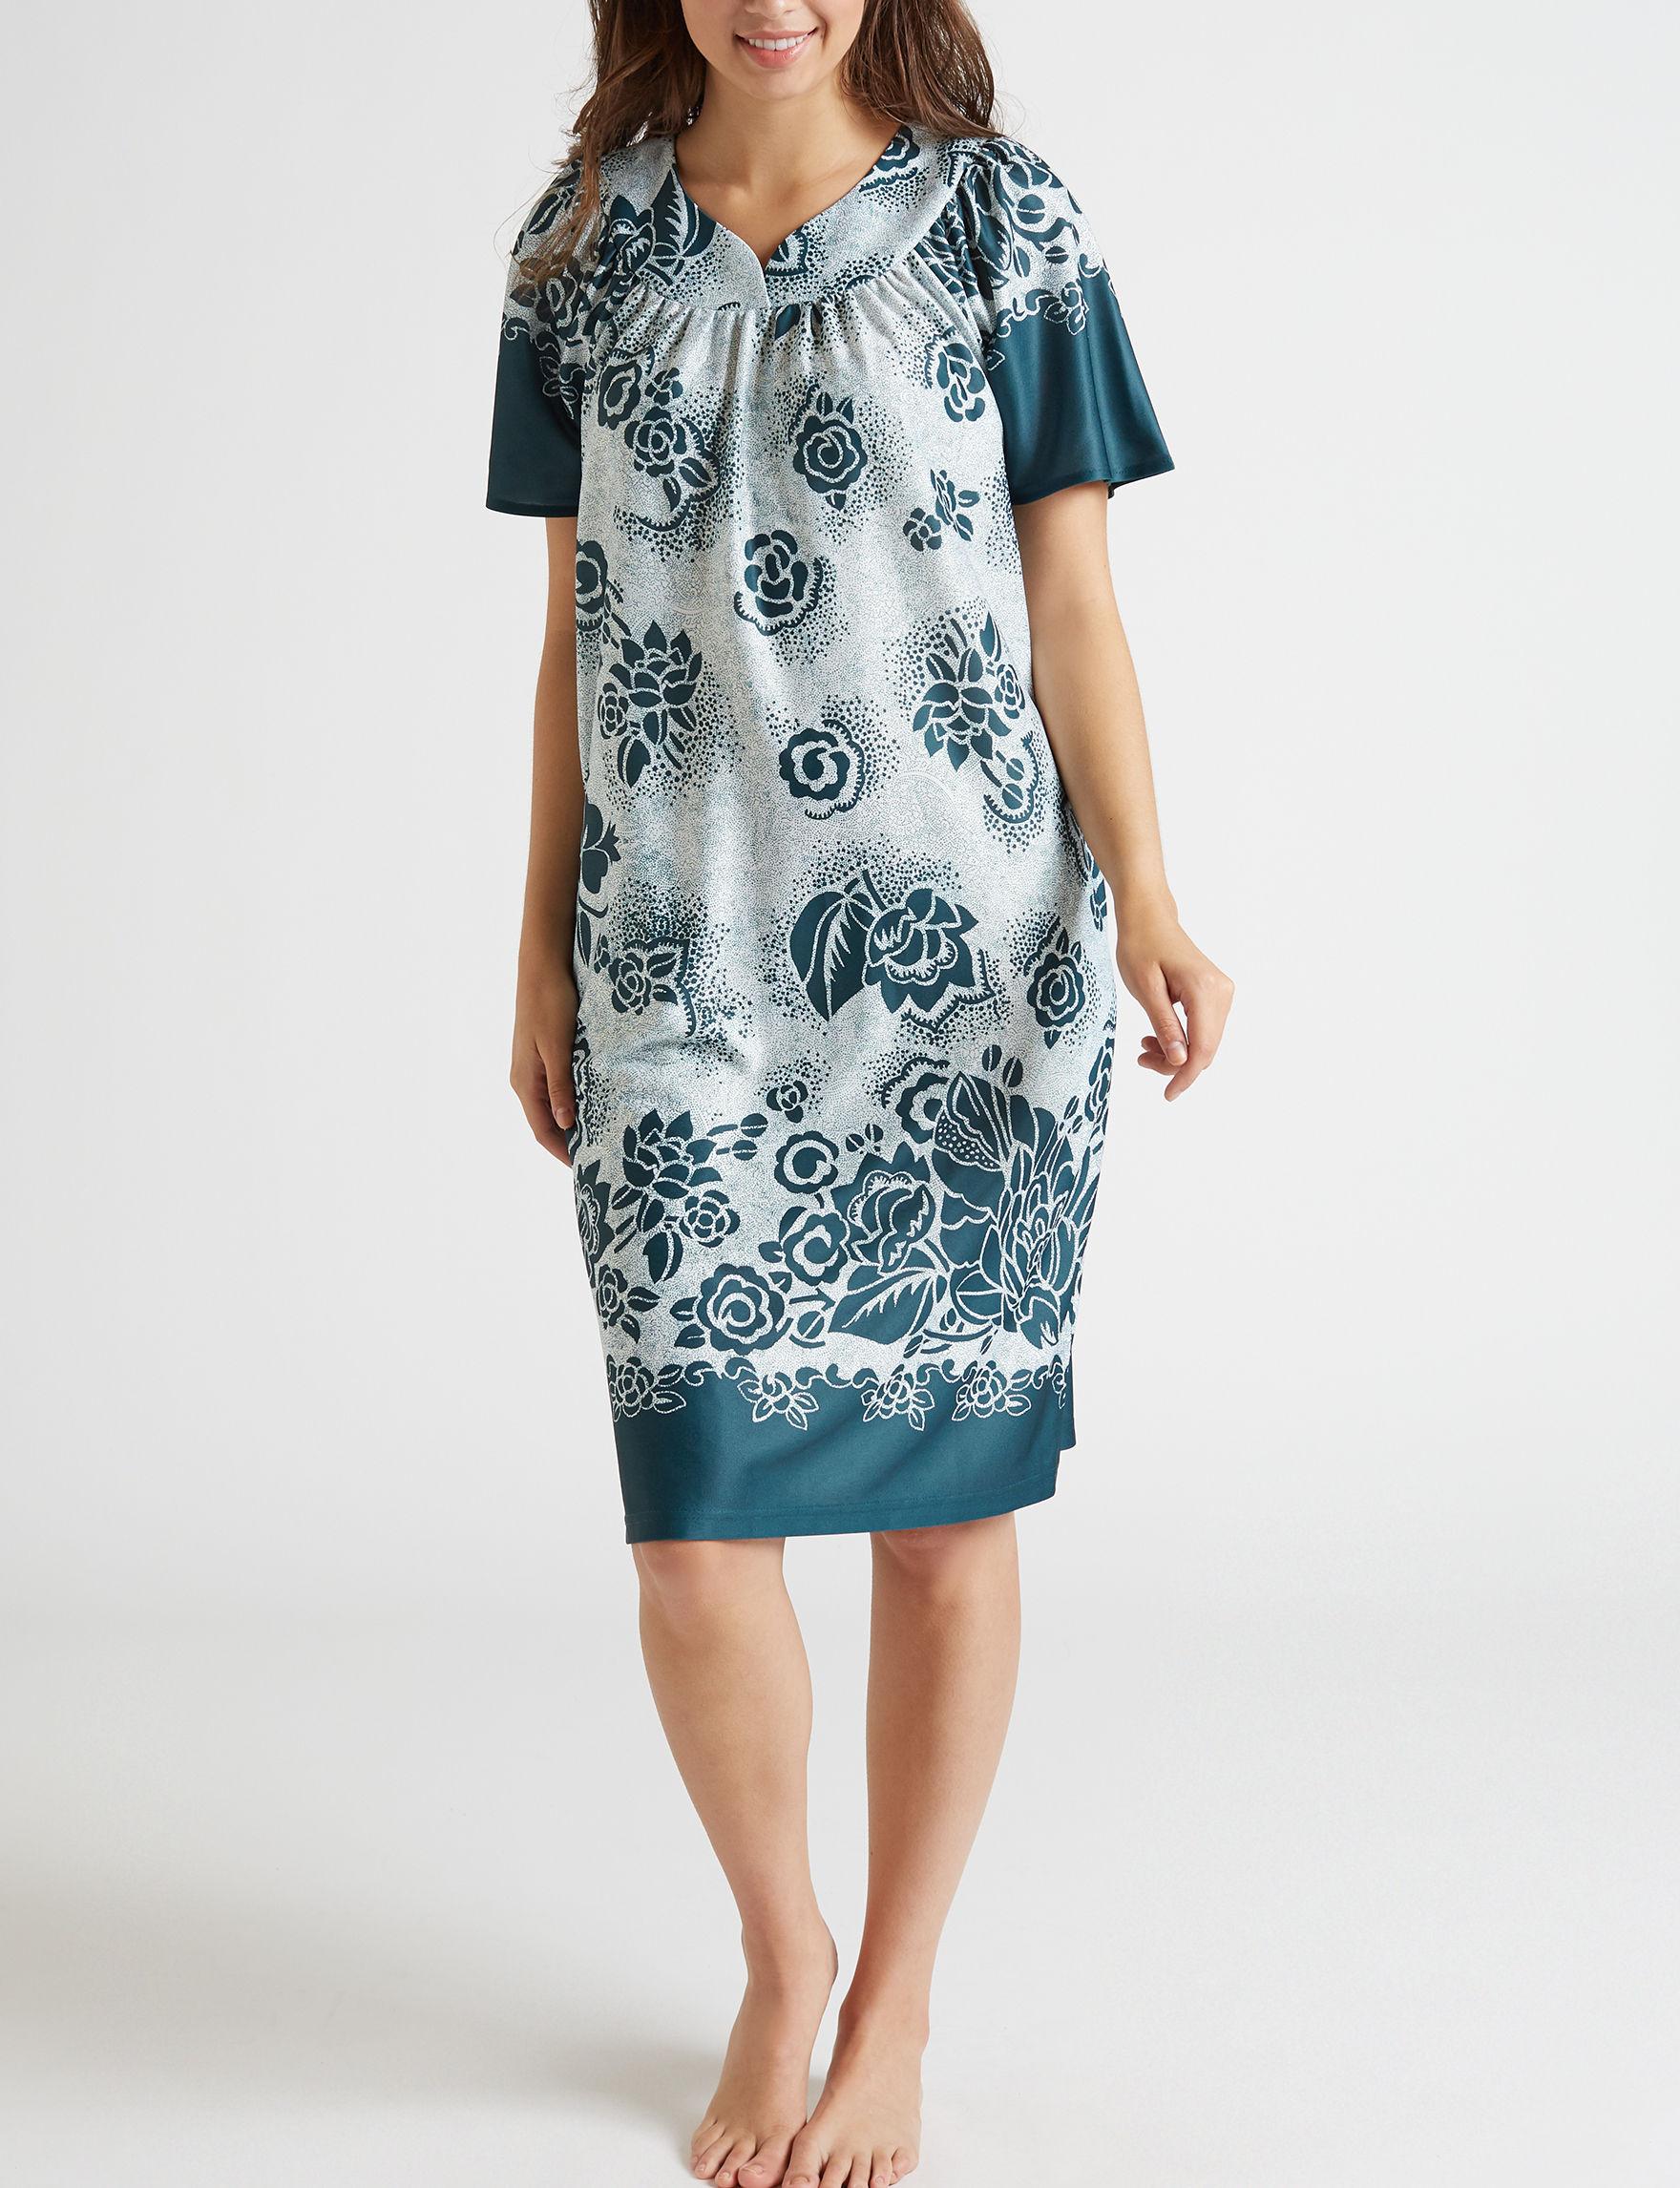 Lissome Teal / White House Dresses